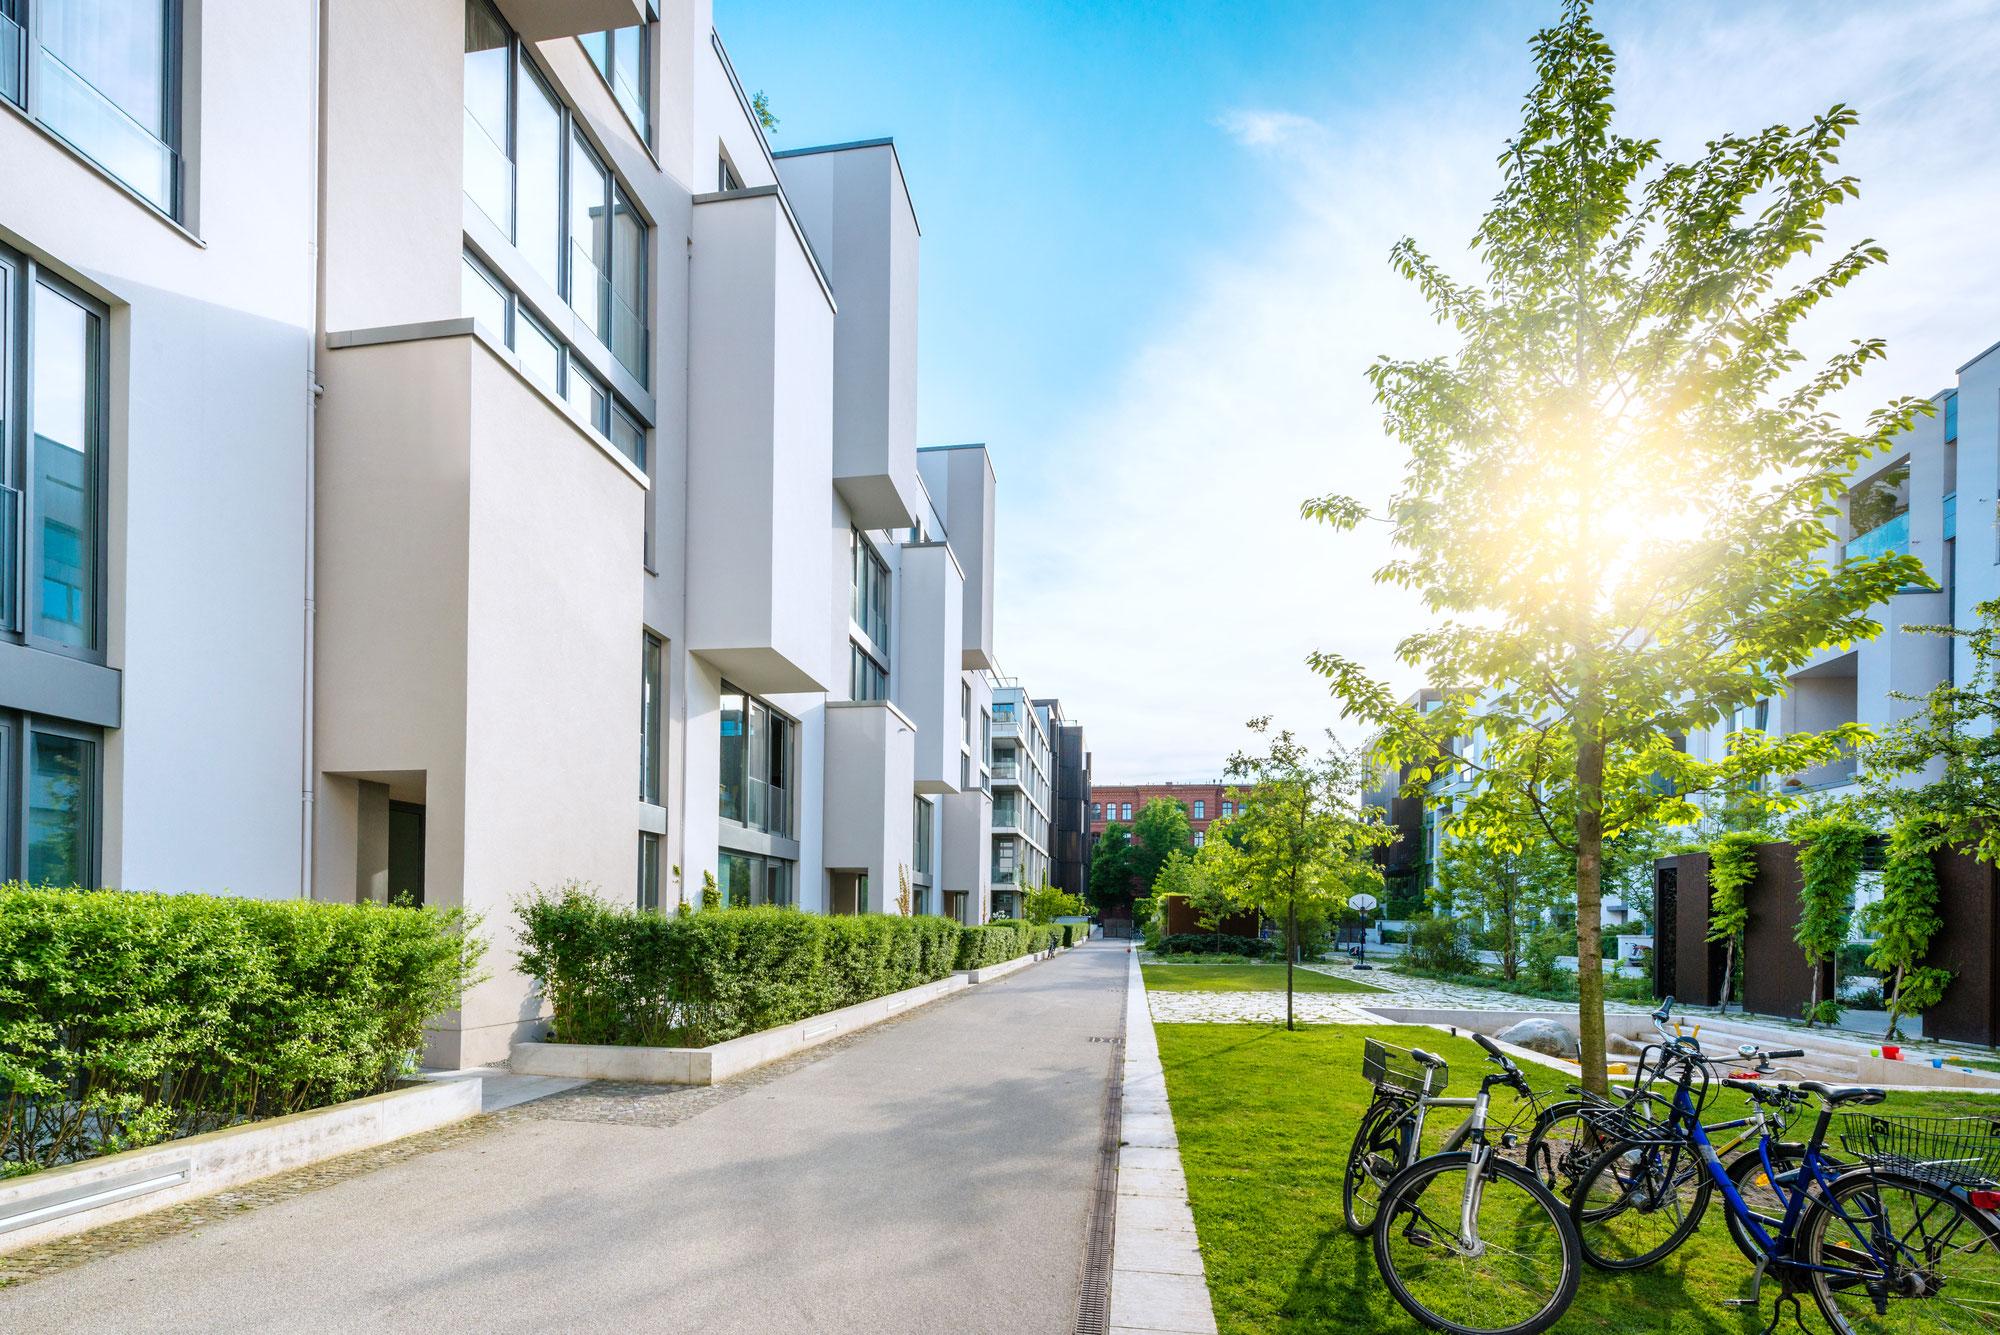 impressum nova immobilien ludwigshafen webseite On immobilien ludwigshafen